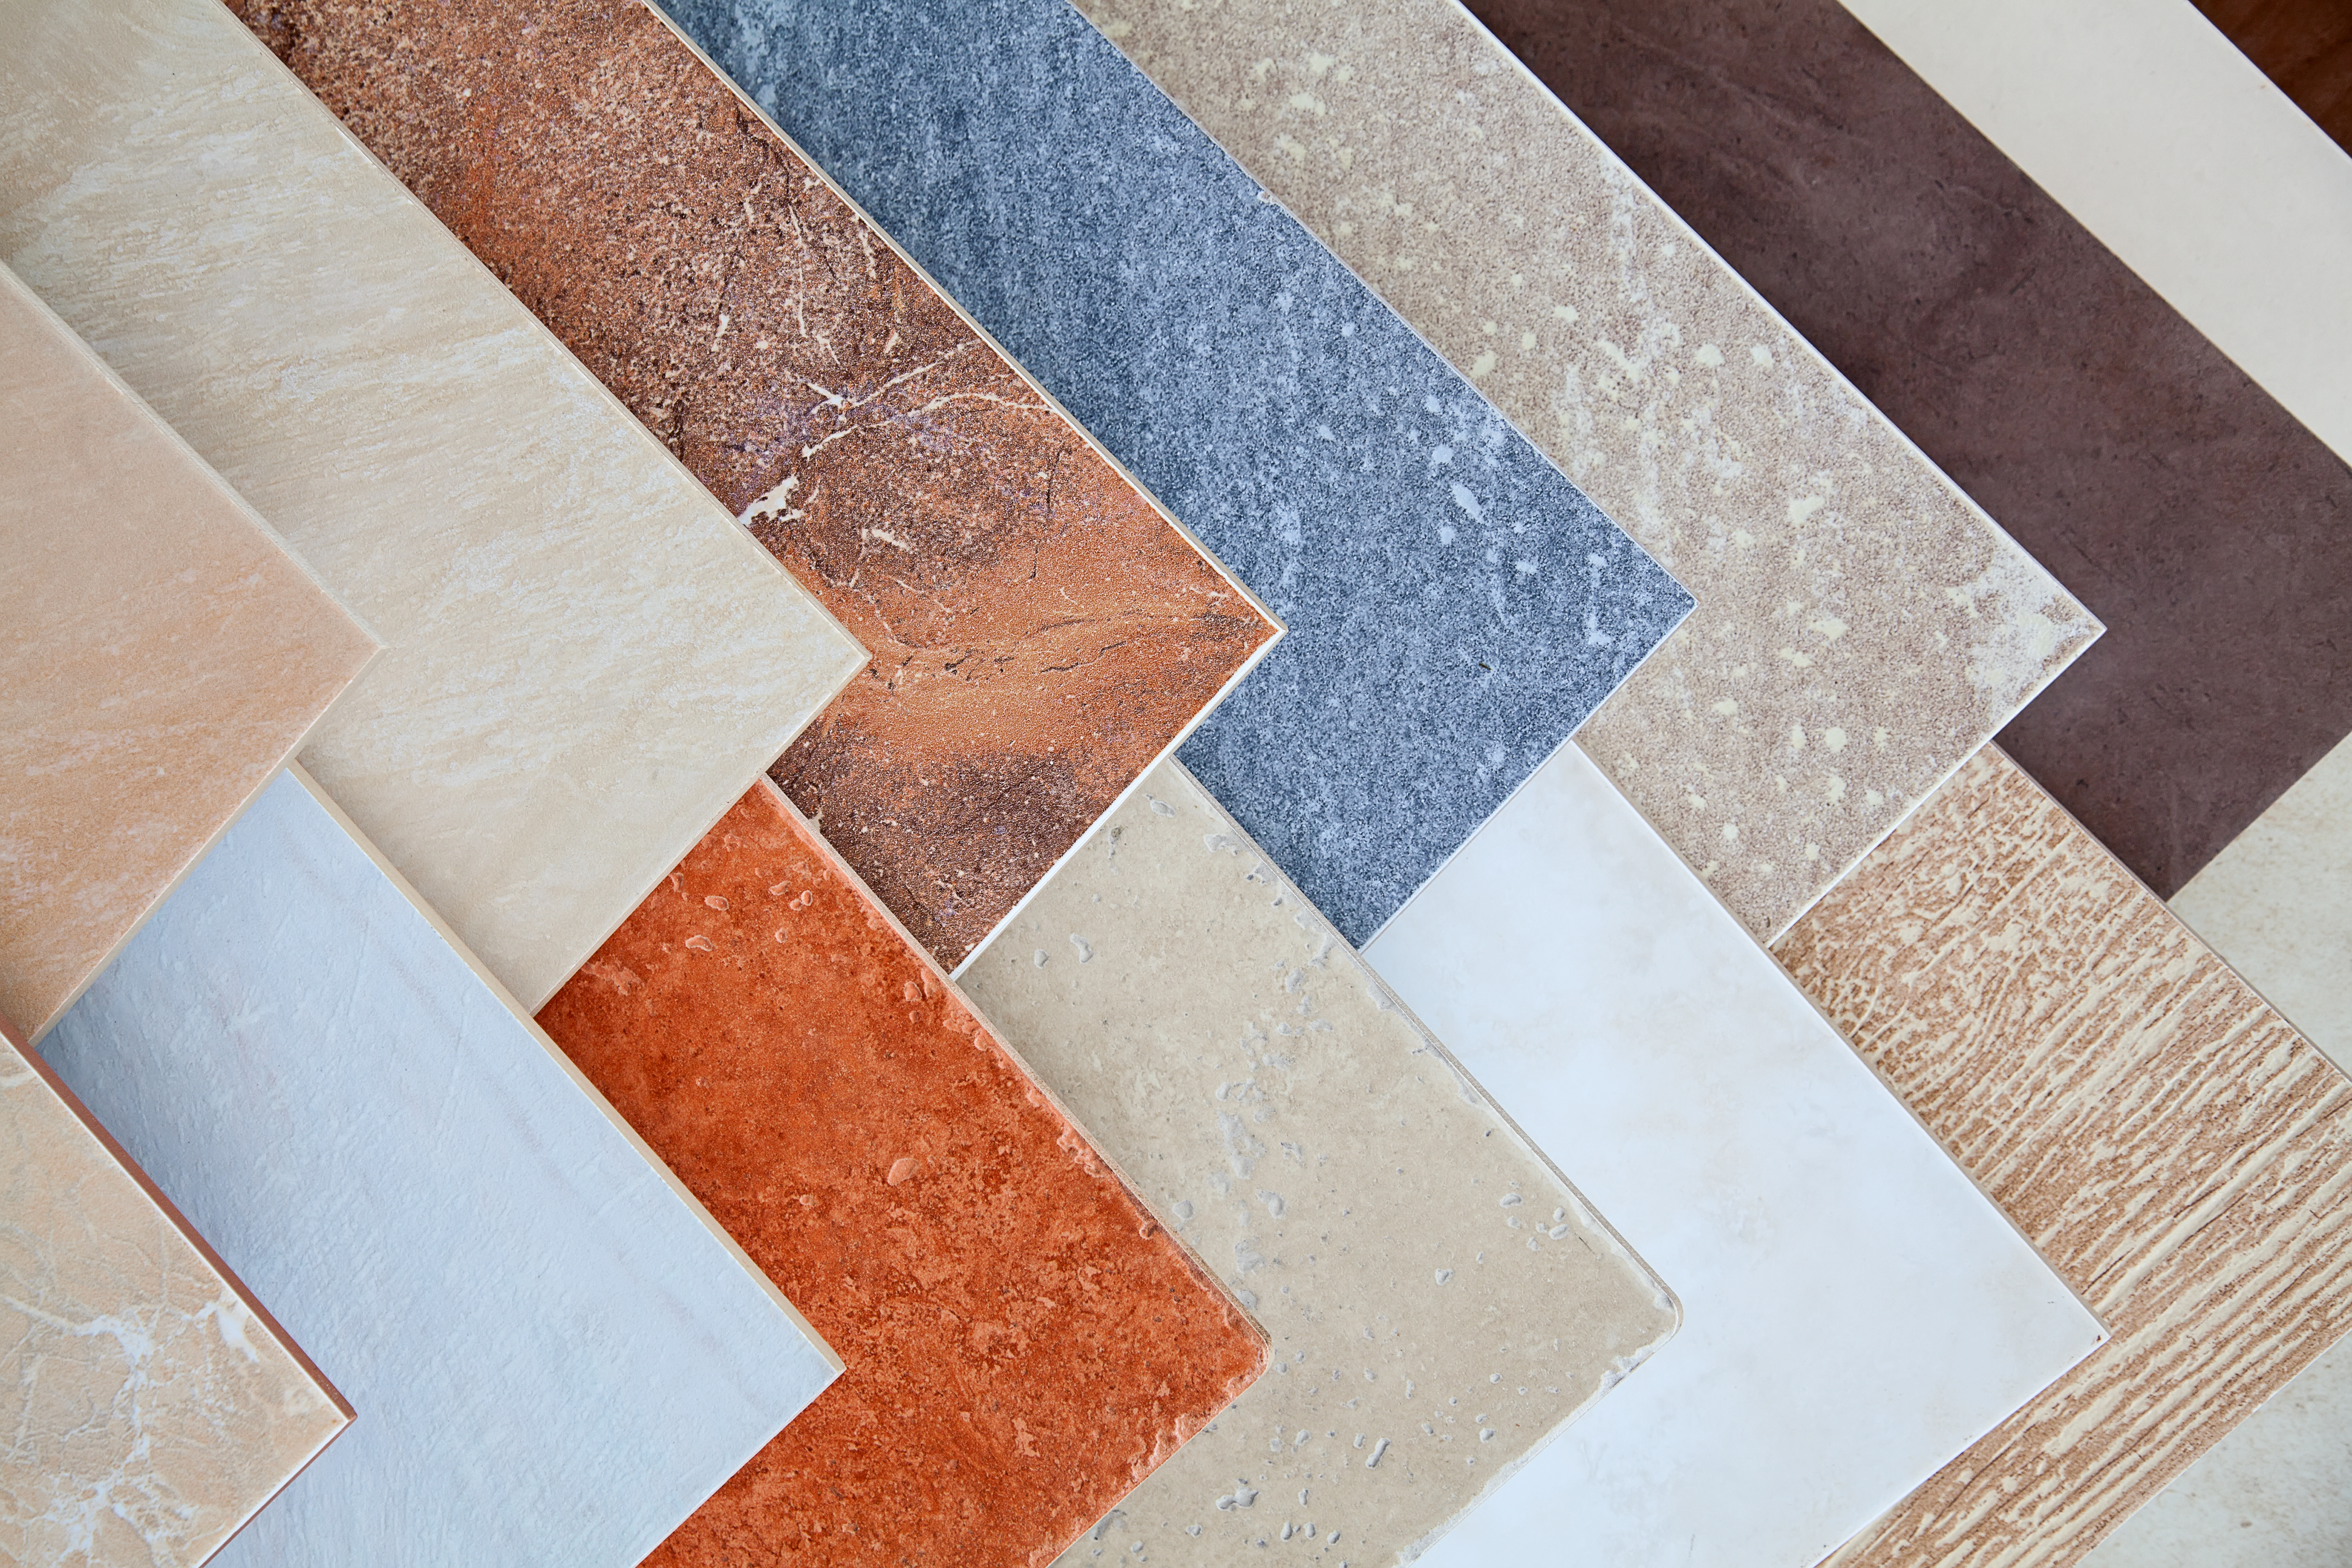 ceramic tile shutterstock_135668507 choose floor coverings international ... ZXHYEJF